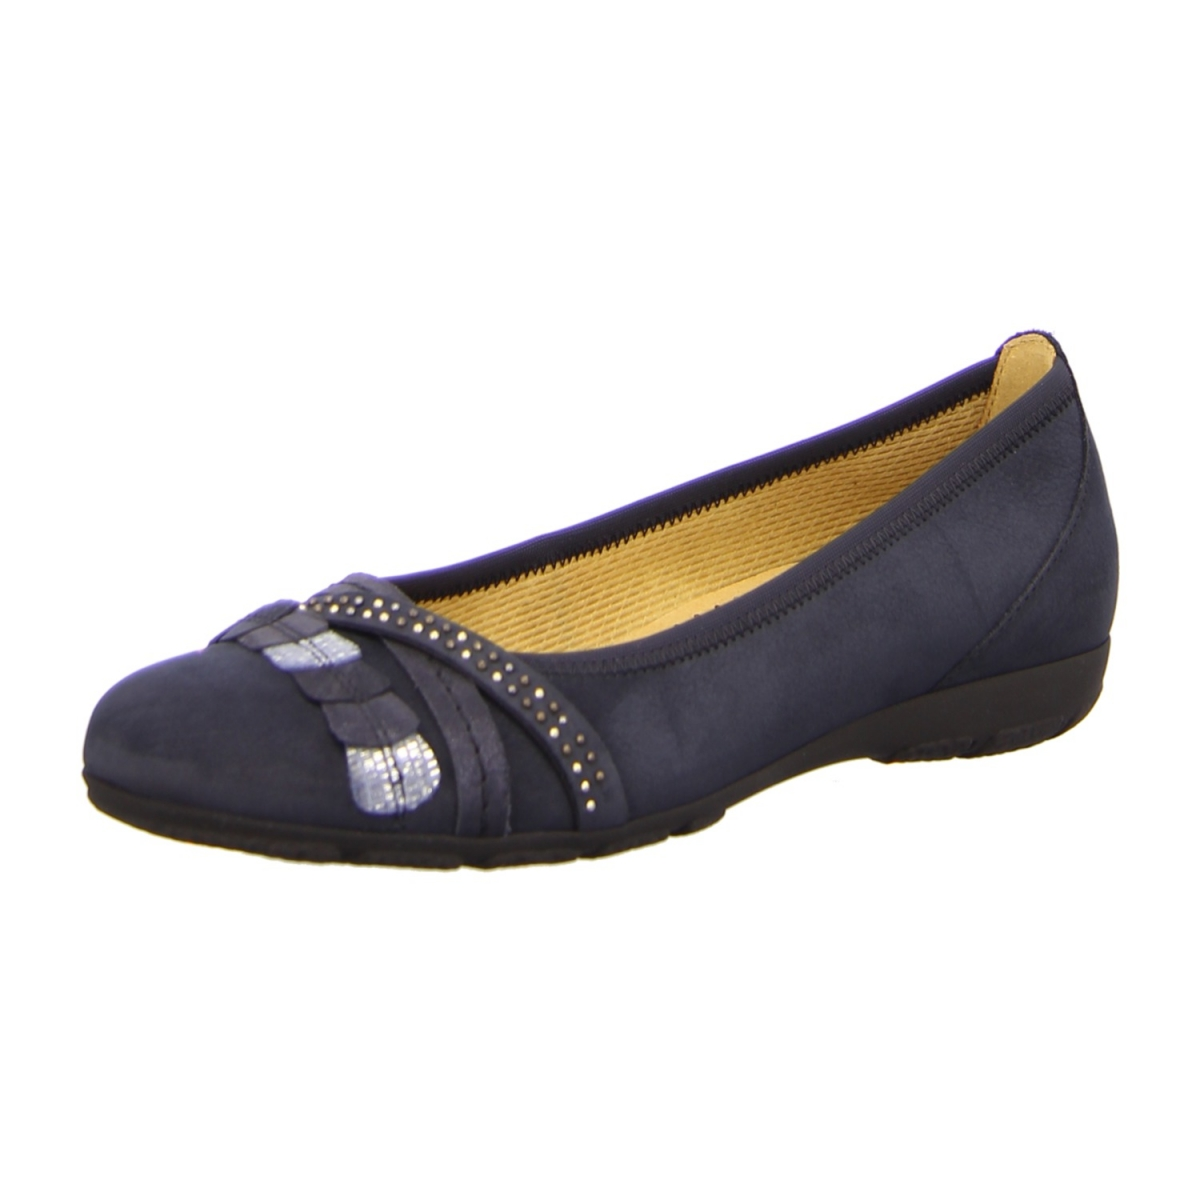 gabor shoes damen fashion geschlossene ballerinas blau pazifik 16 43 eu 9 uk. Black Bedroom Furniture Sets. Home Design Ideas